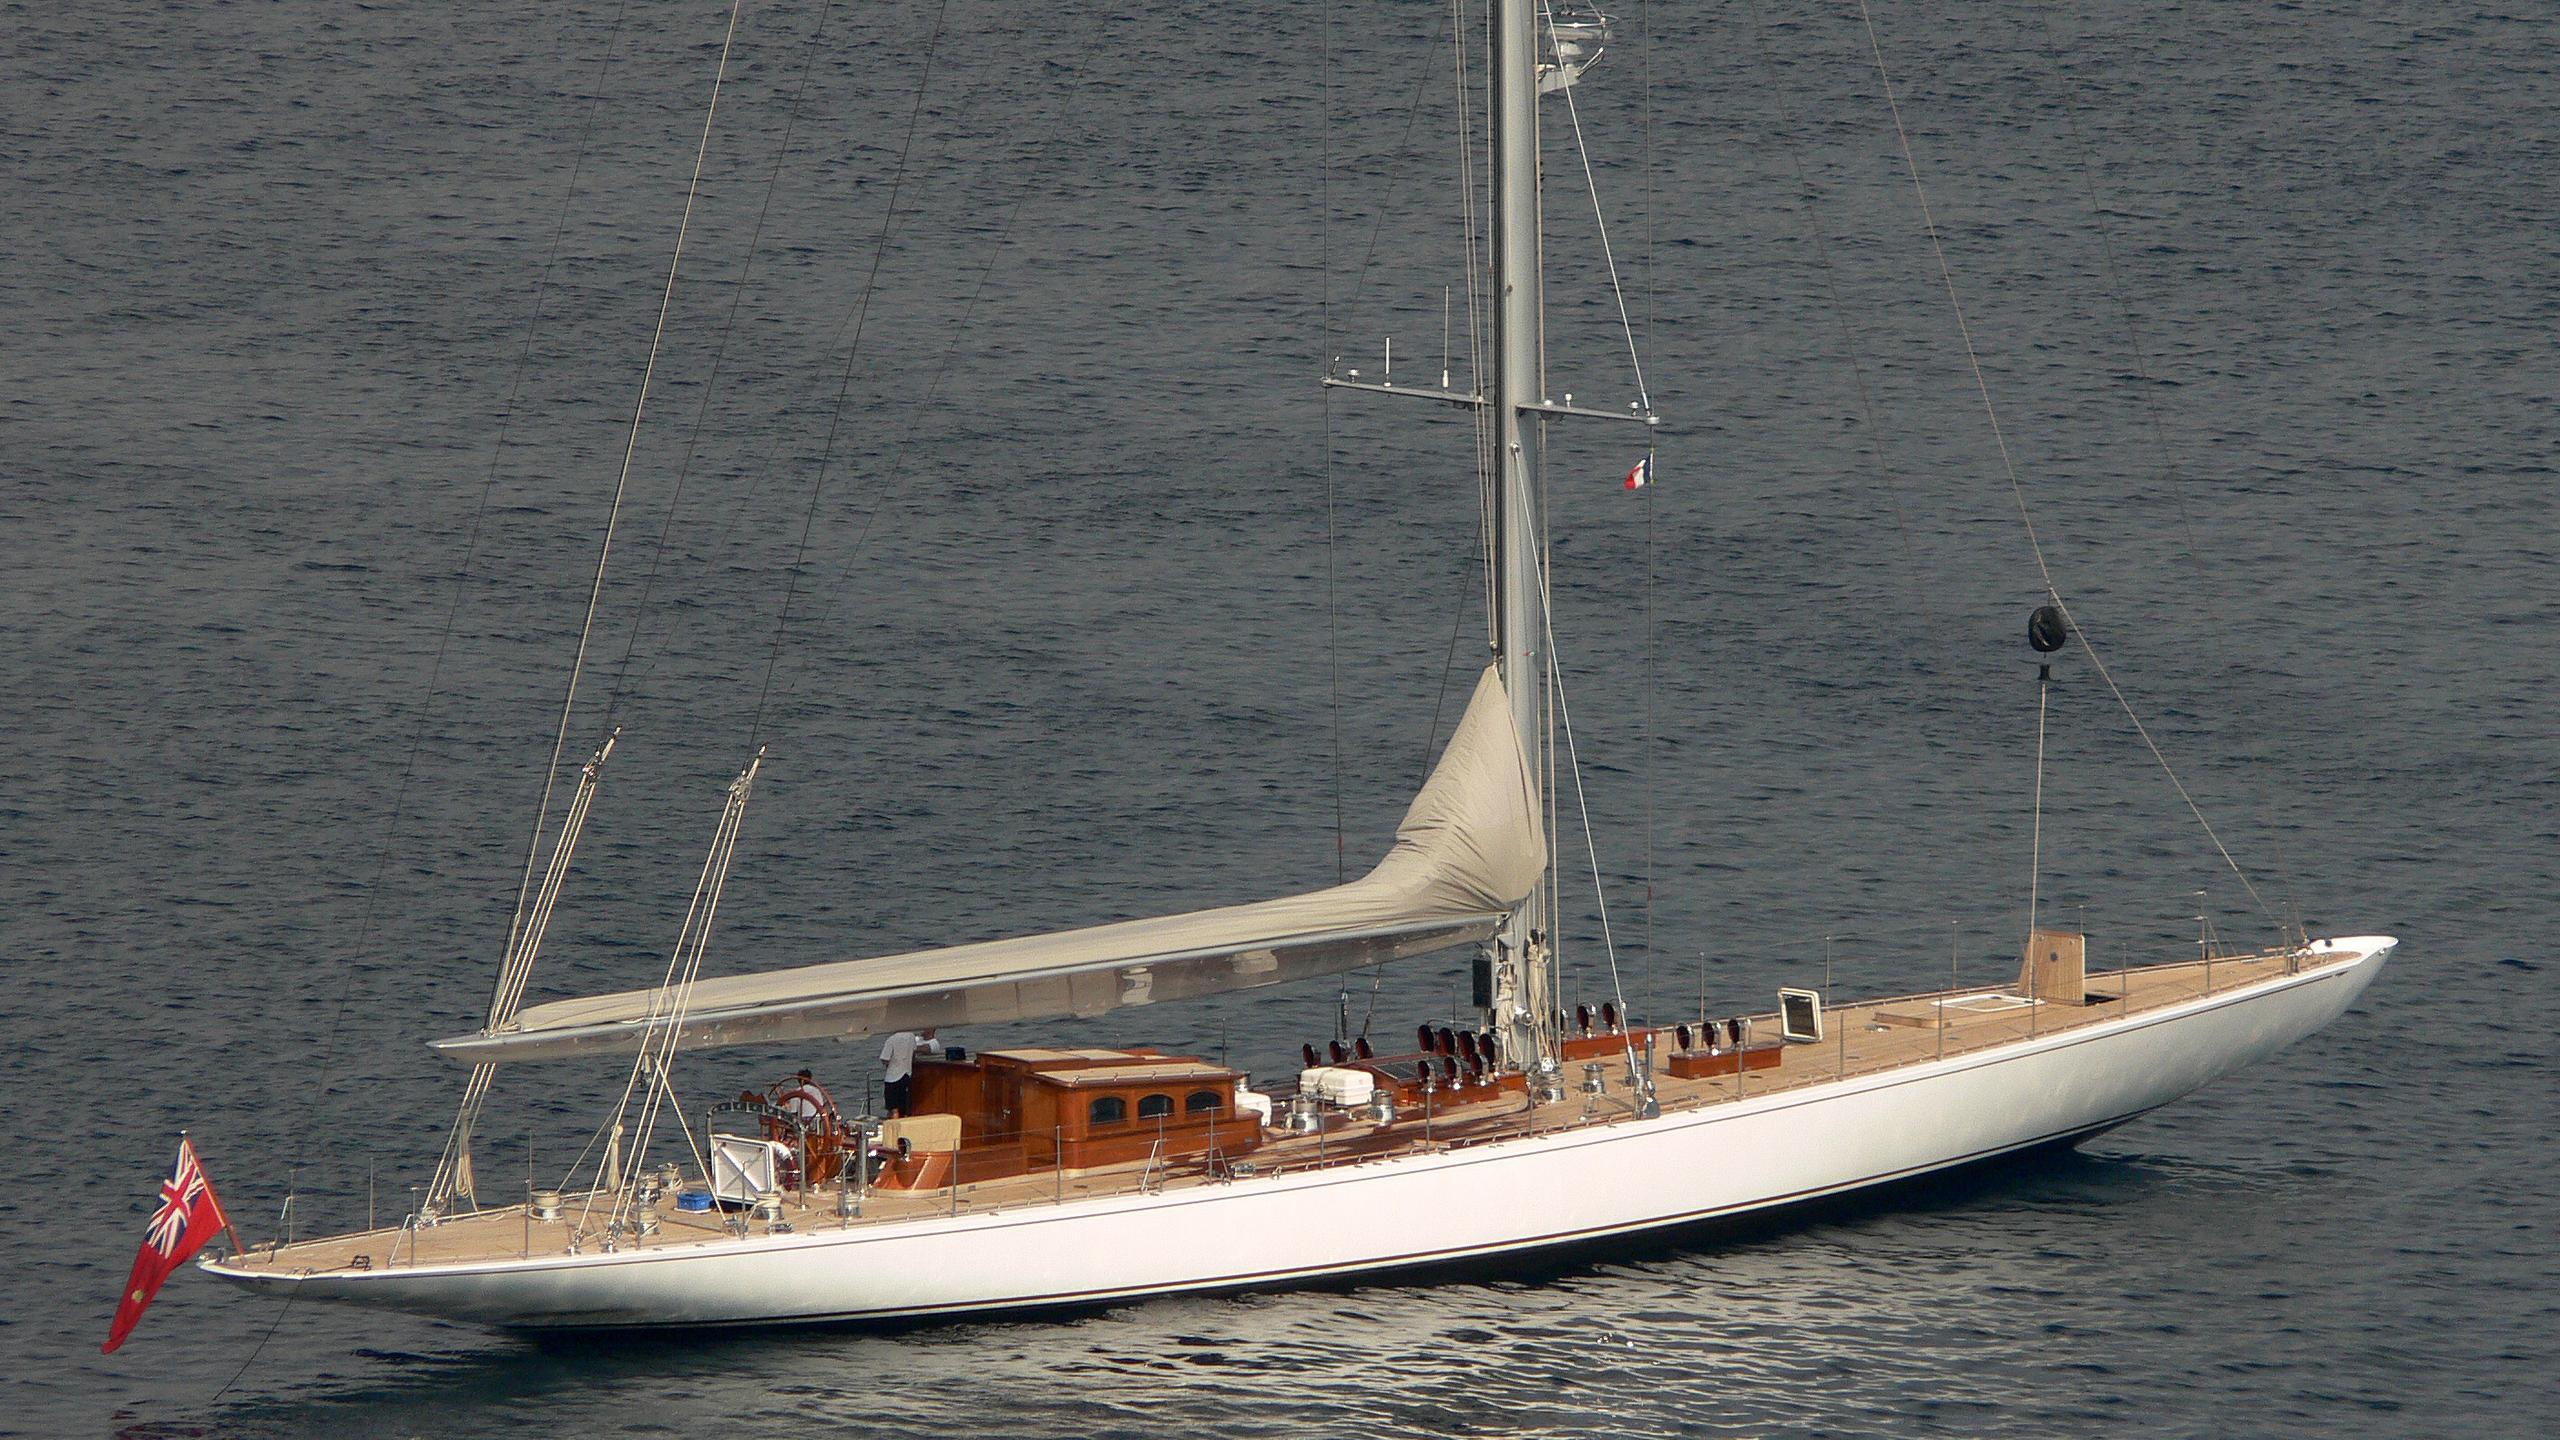 ranger-sailing-yacht-danish-2003-42m-moored